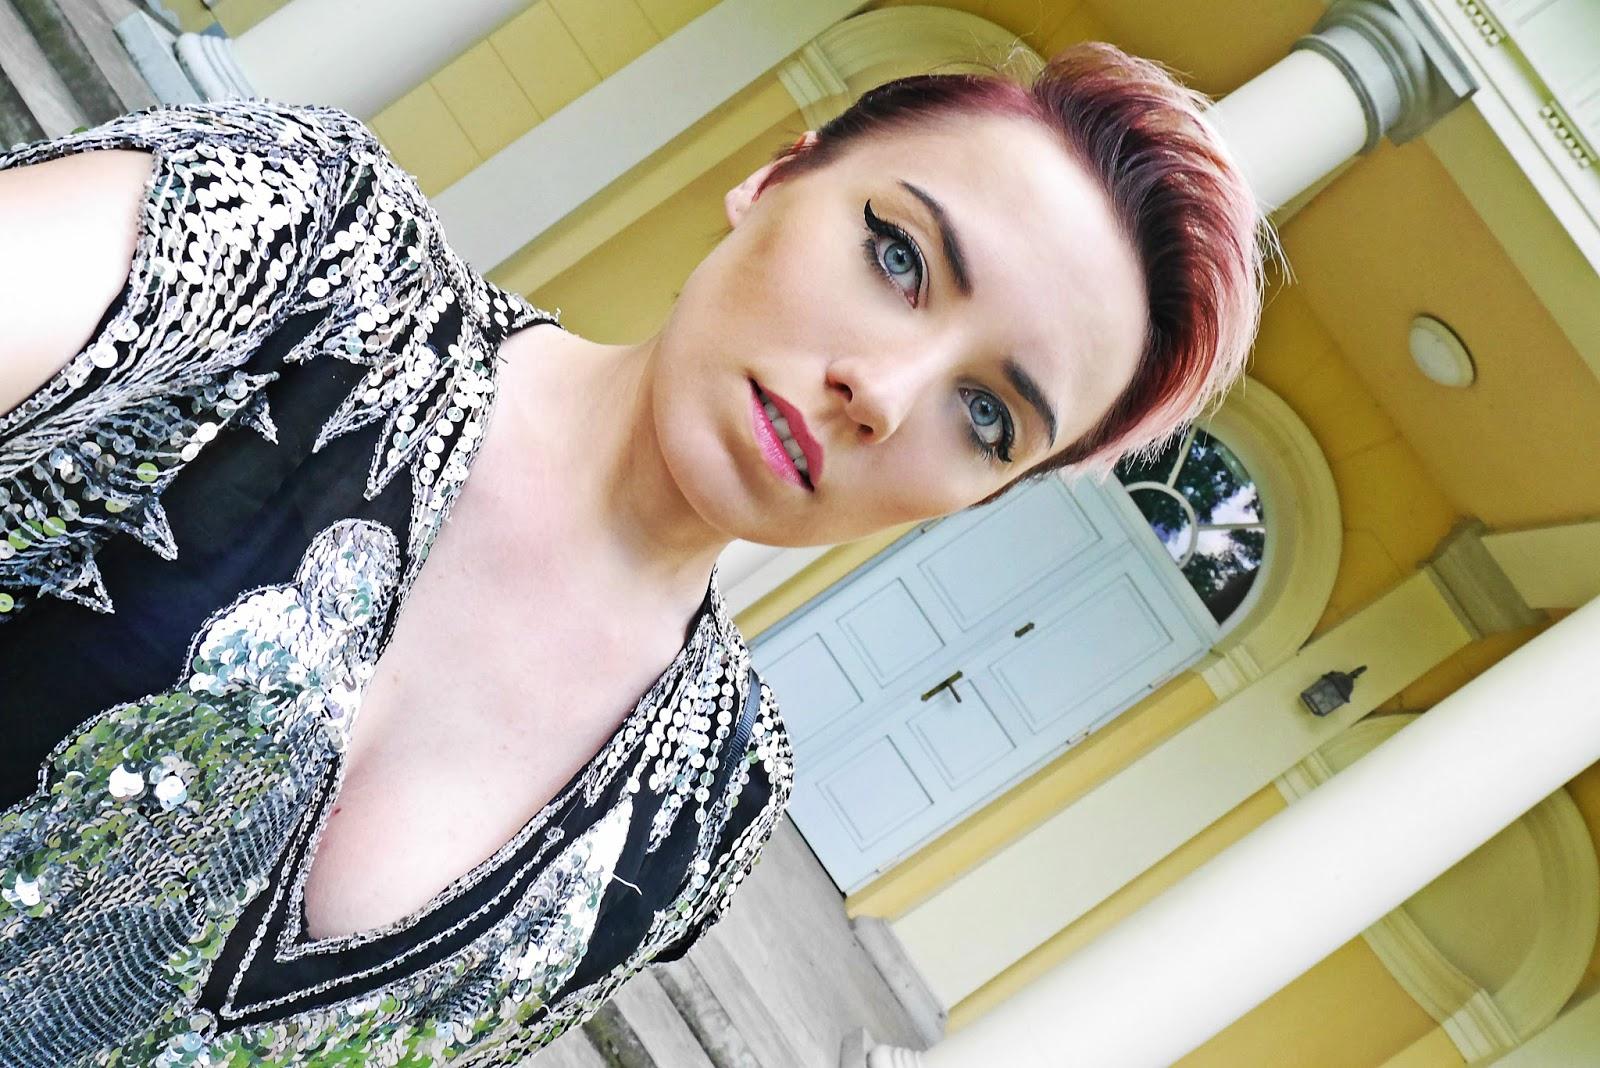 blog_modowy_blogerka_modowa_karyn_look_pulawy_300517df